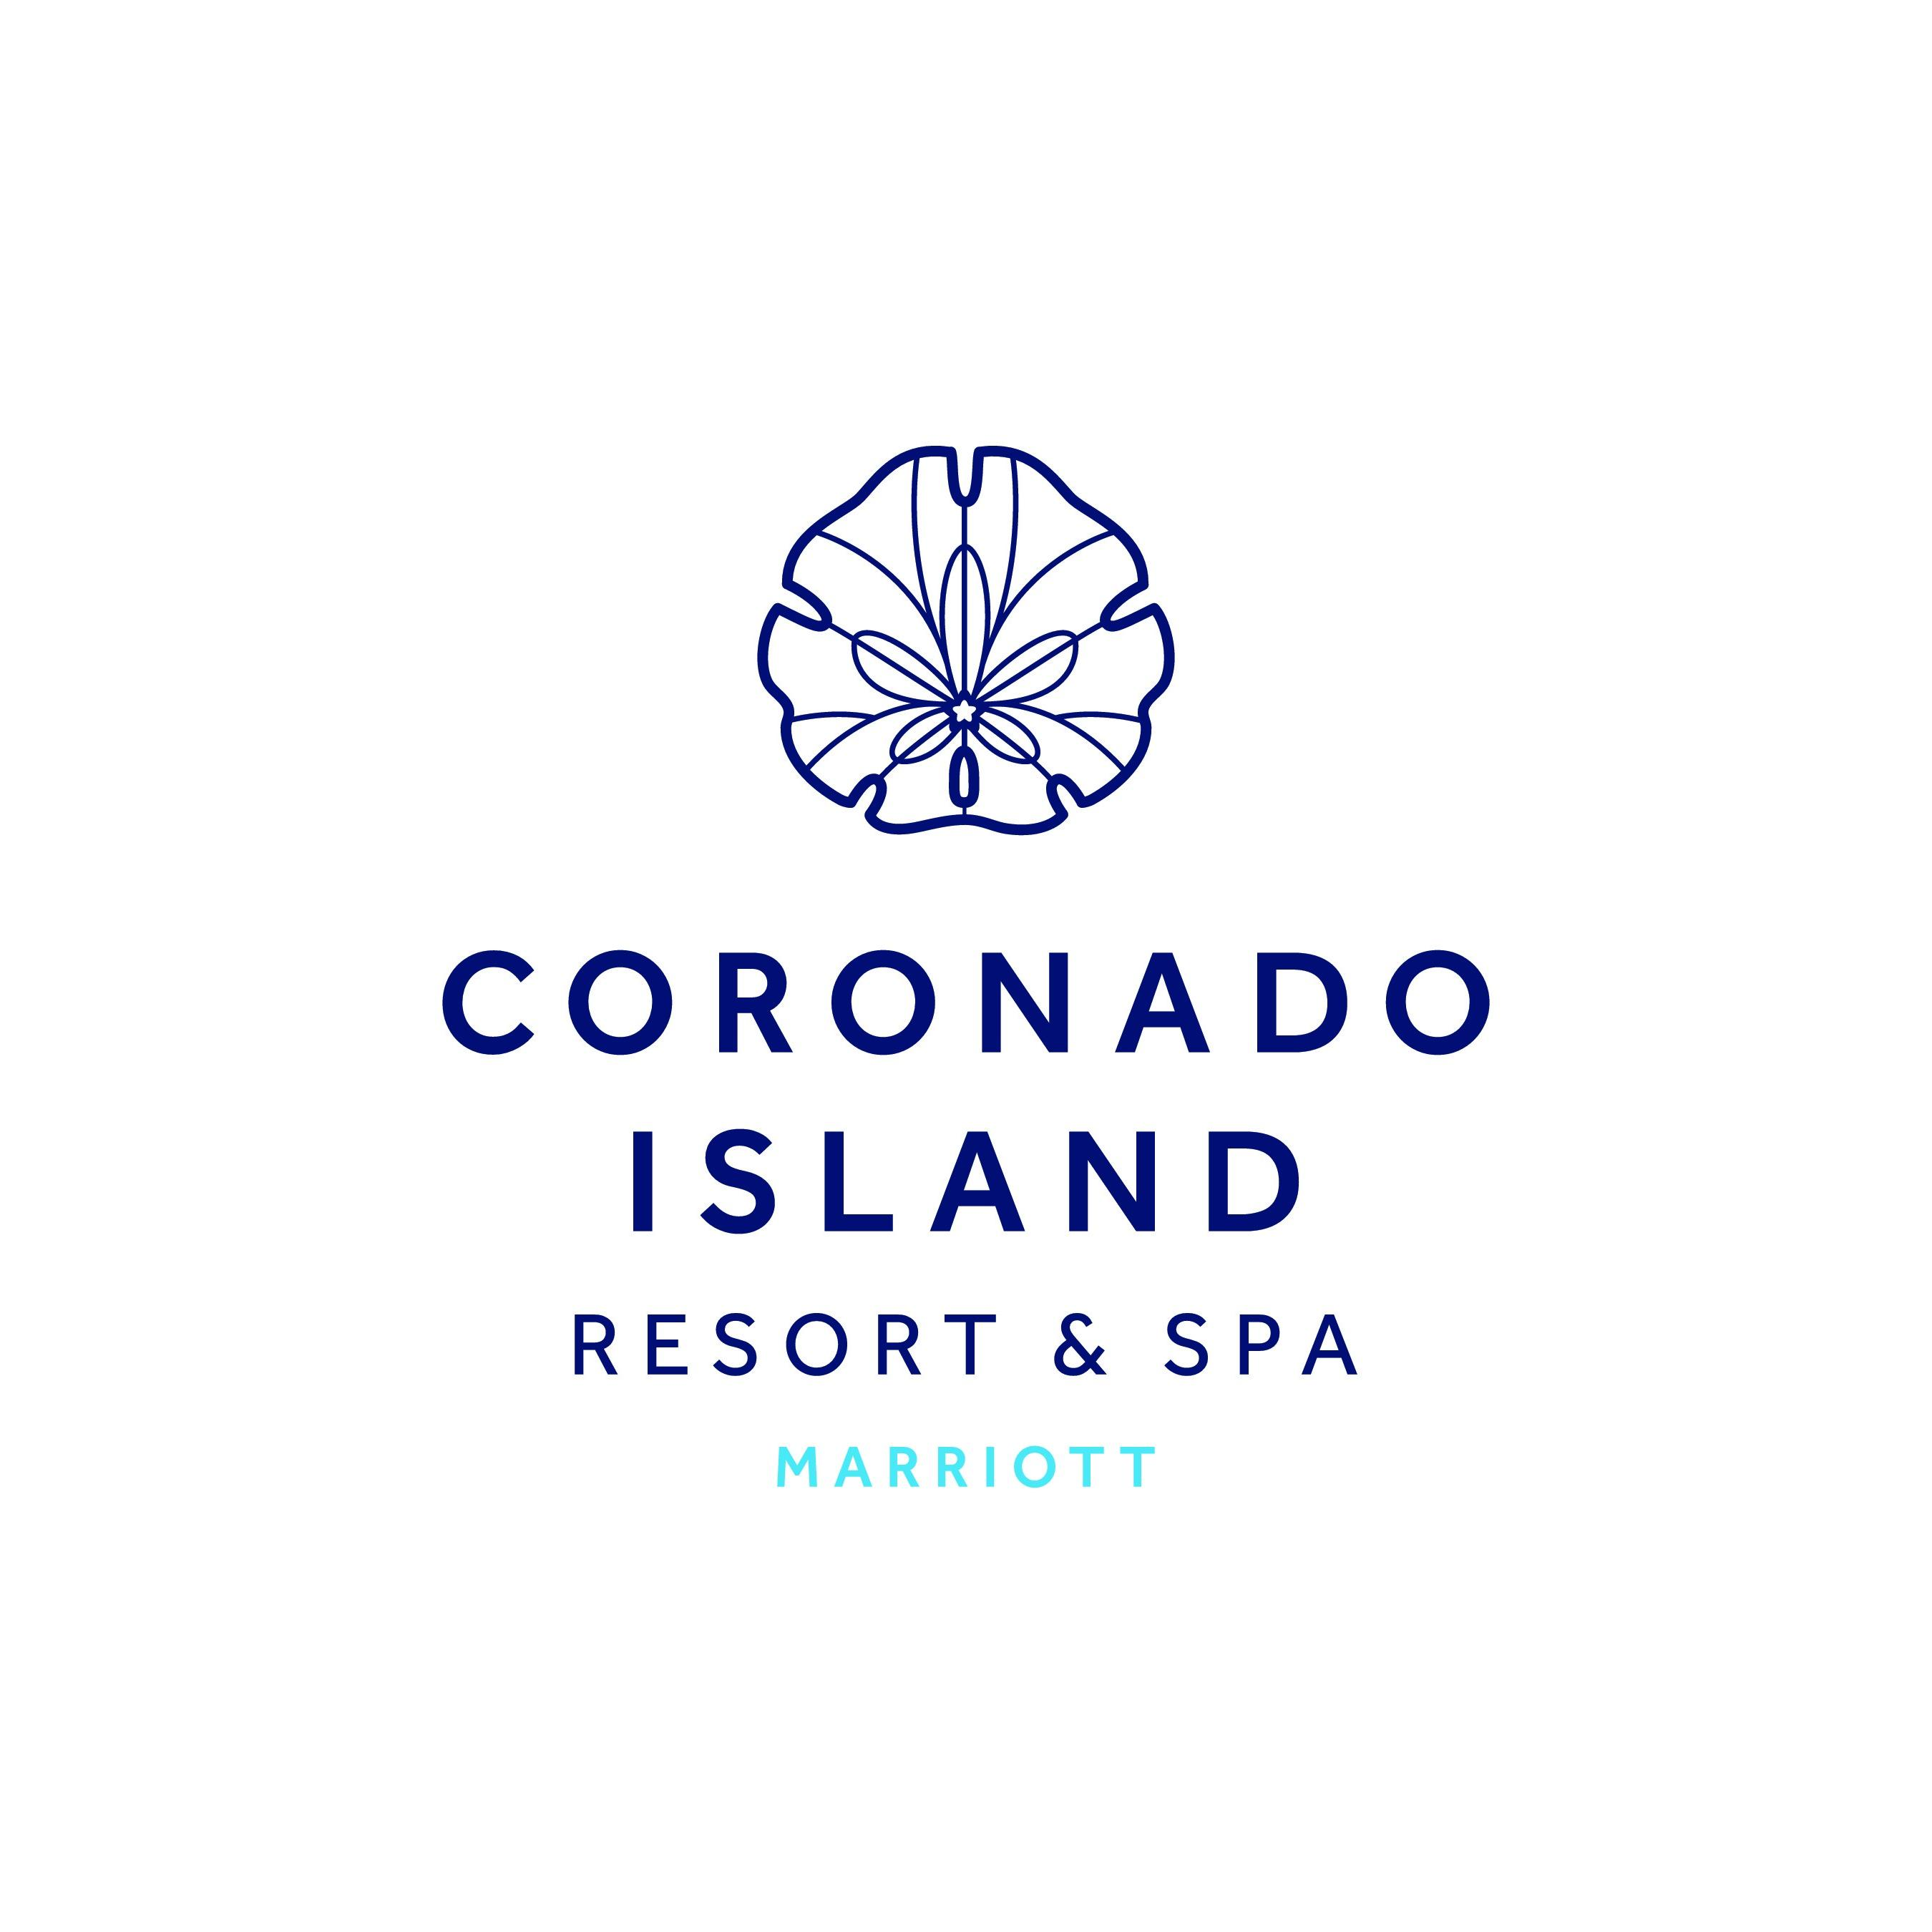 Coronado island marriott resort spa coupons near me in for Hotel spa resort near me